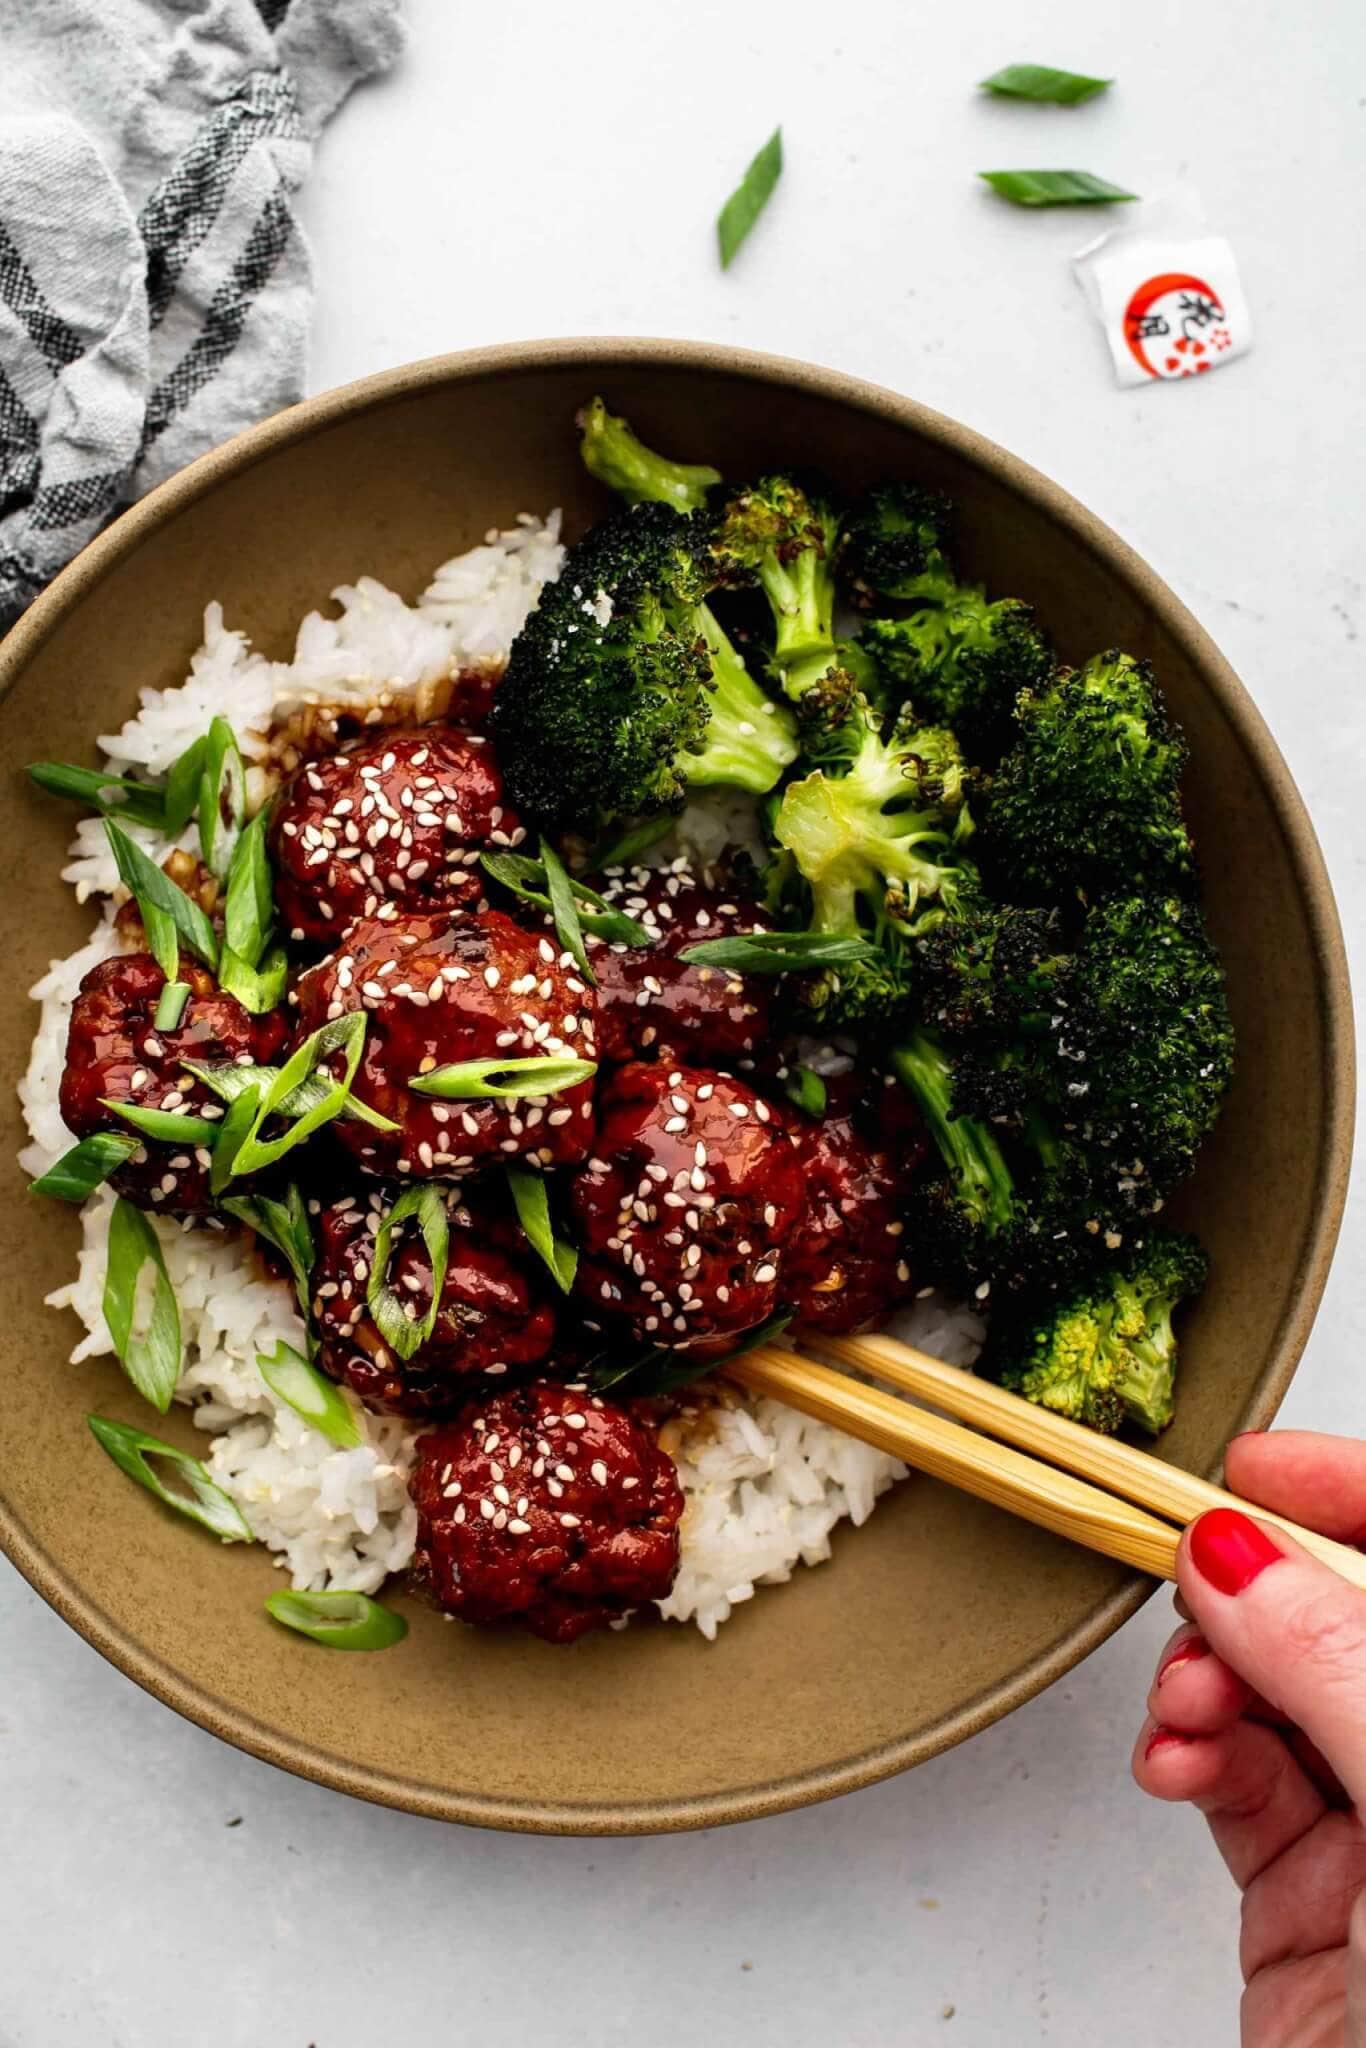 Hand holding chopsticks eating bowl of mongolian meatballs.